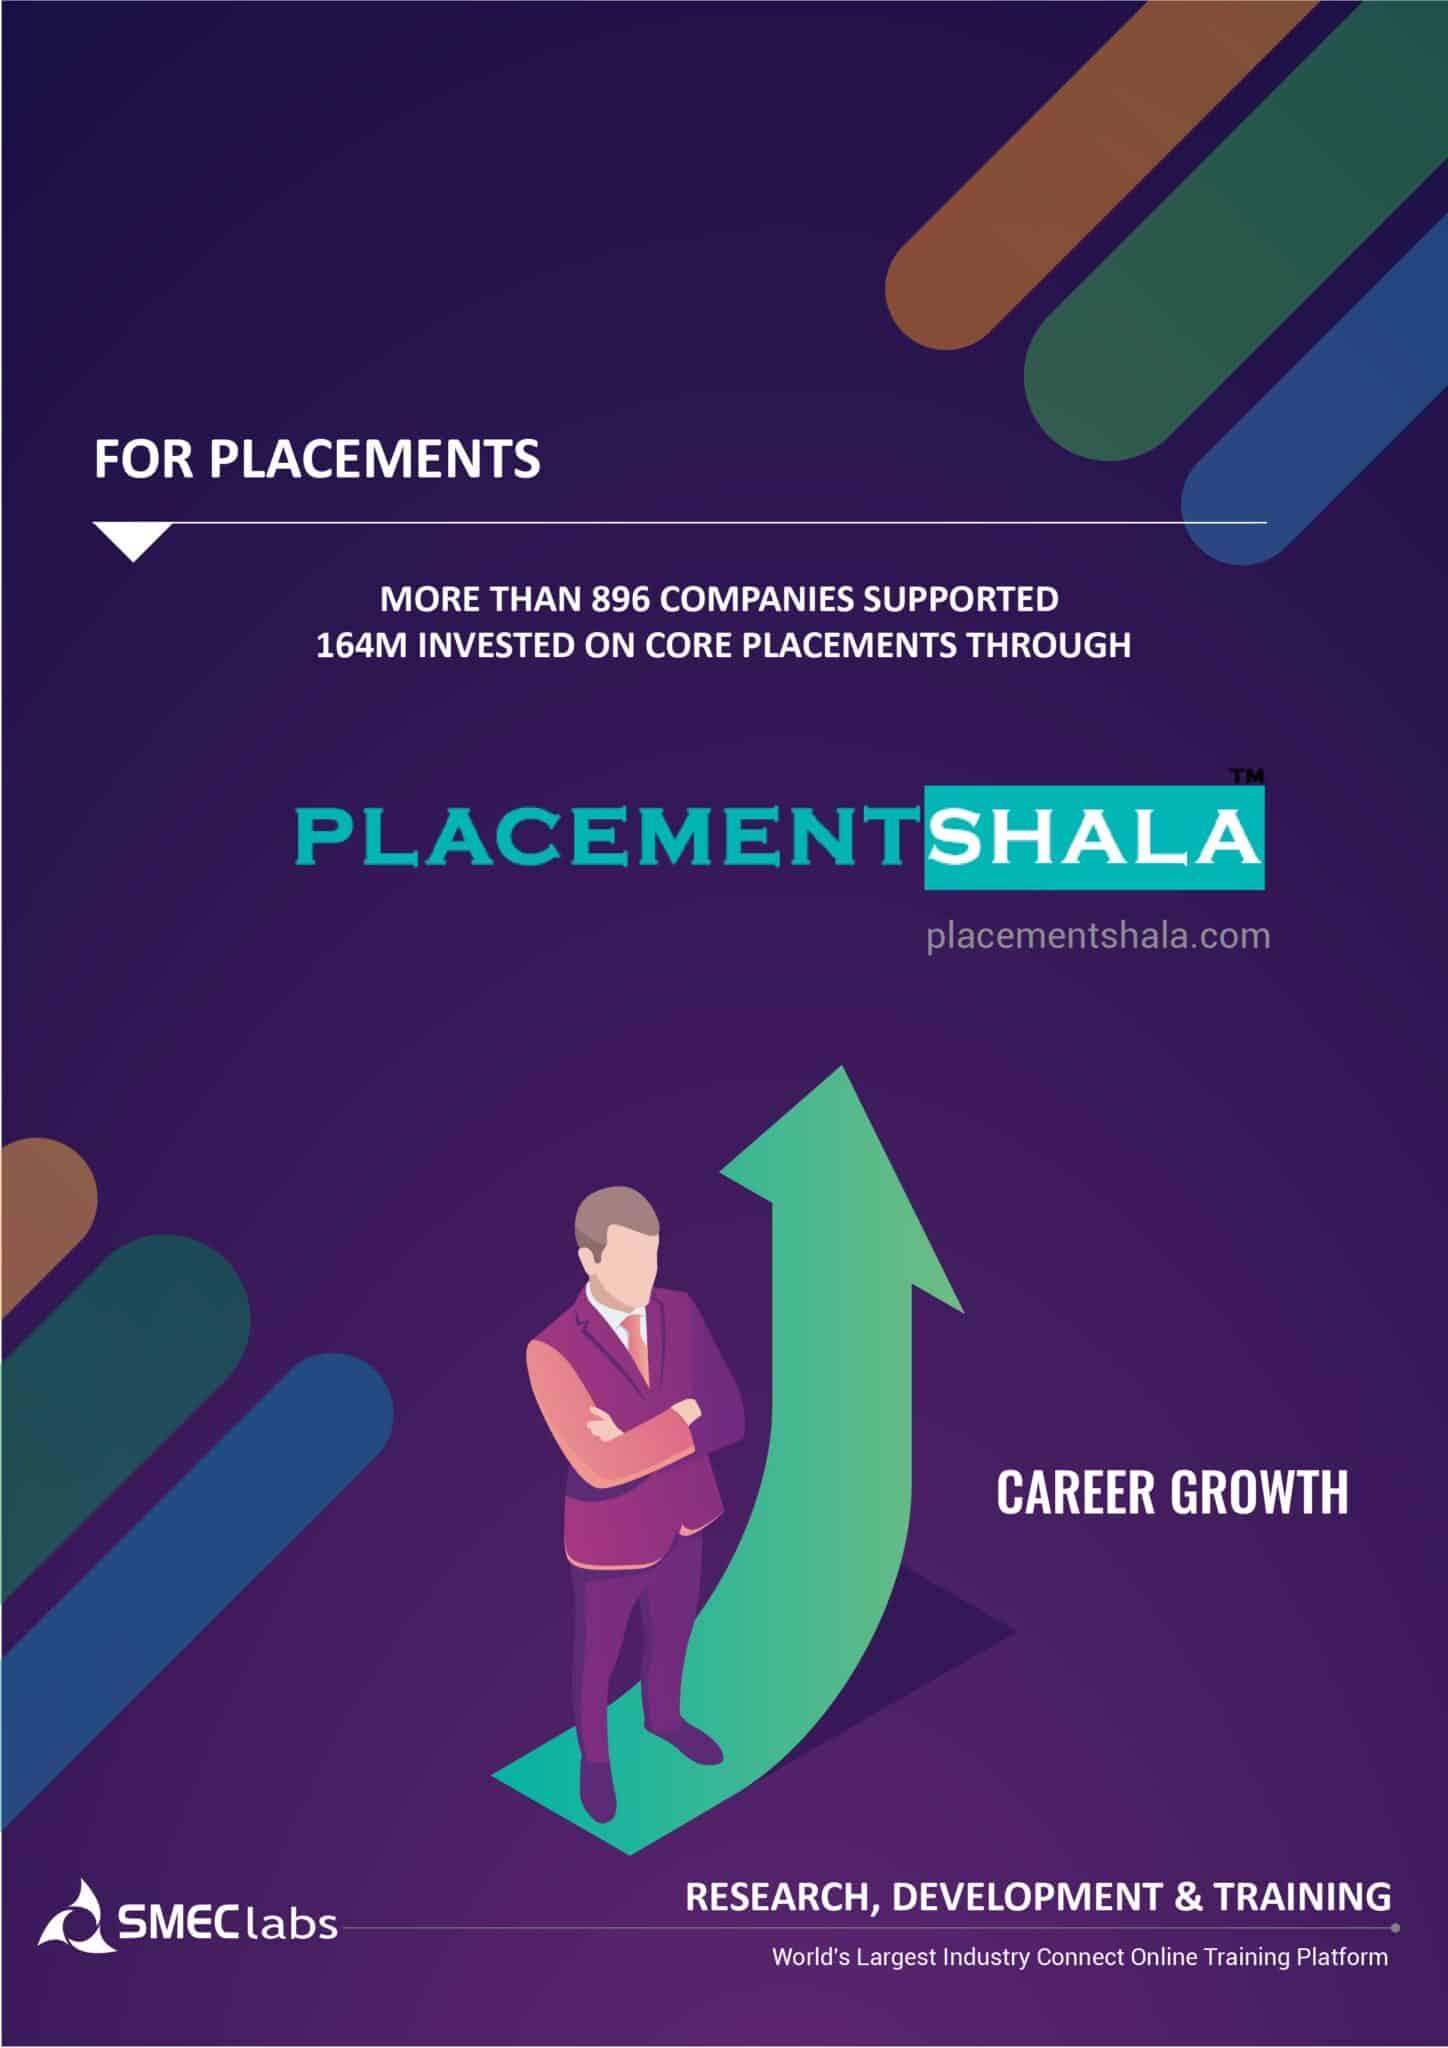 smeclabs-placementshala-100% placement assistance